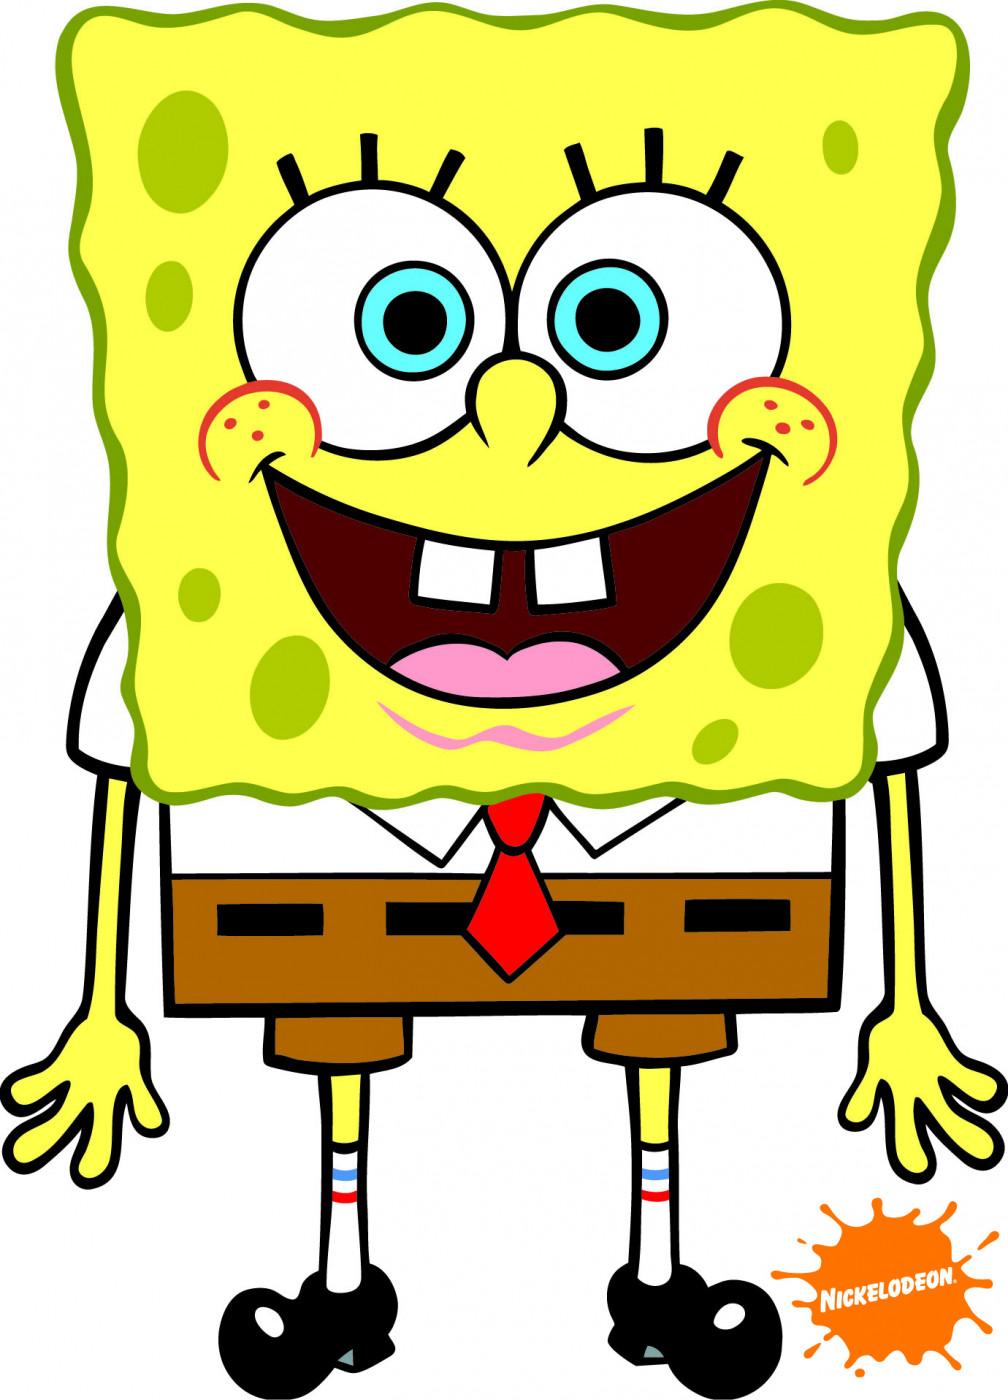 SpongeBob-with-logo